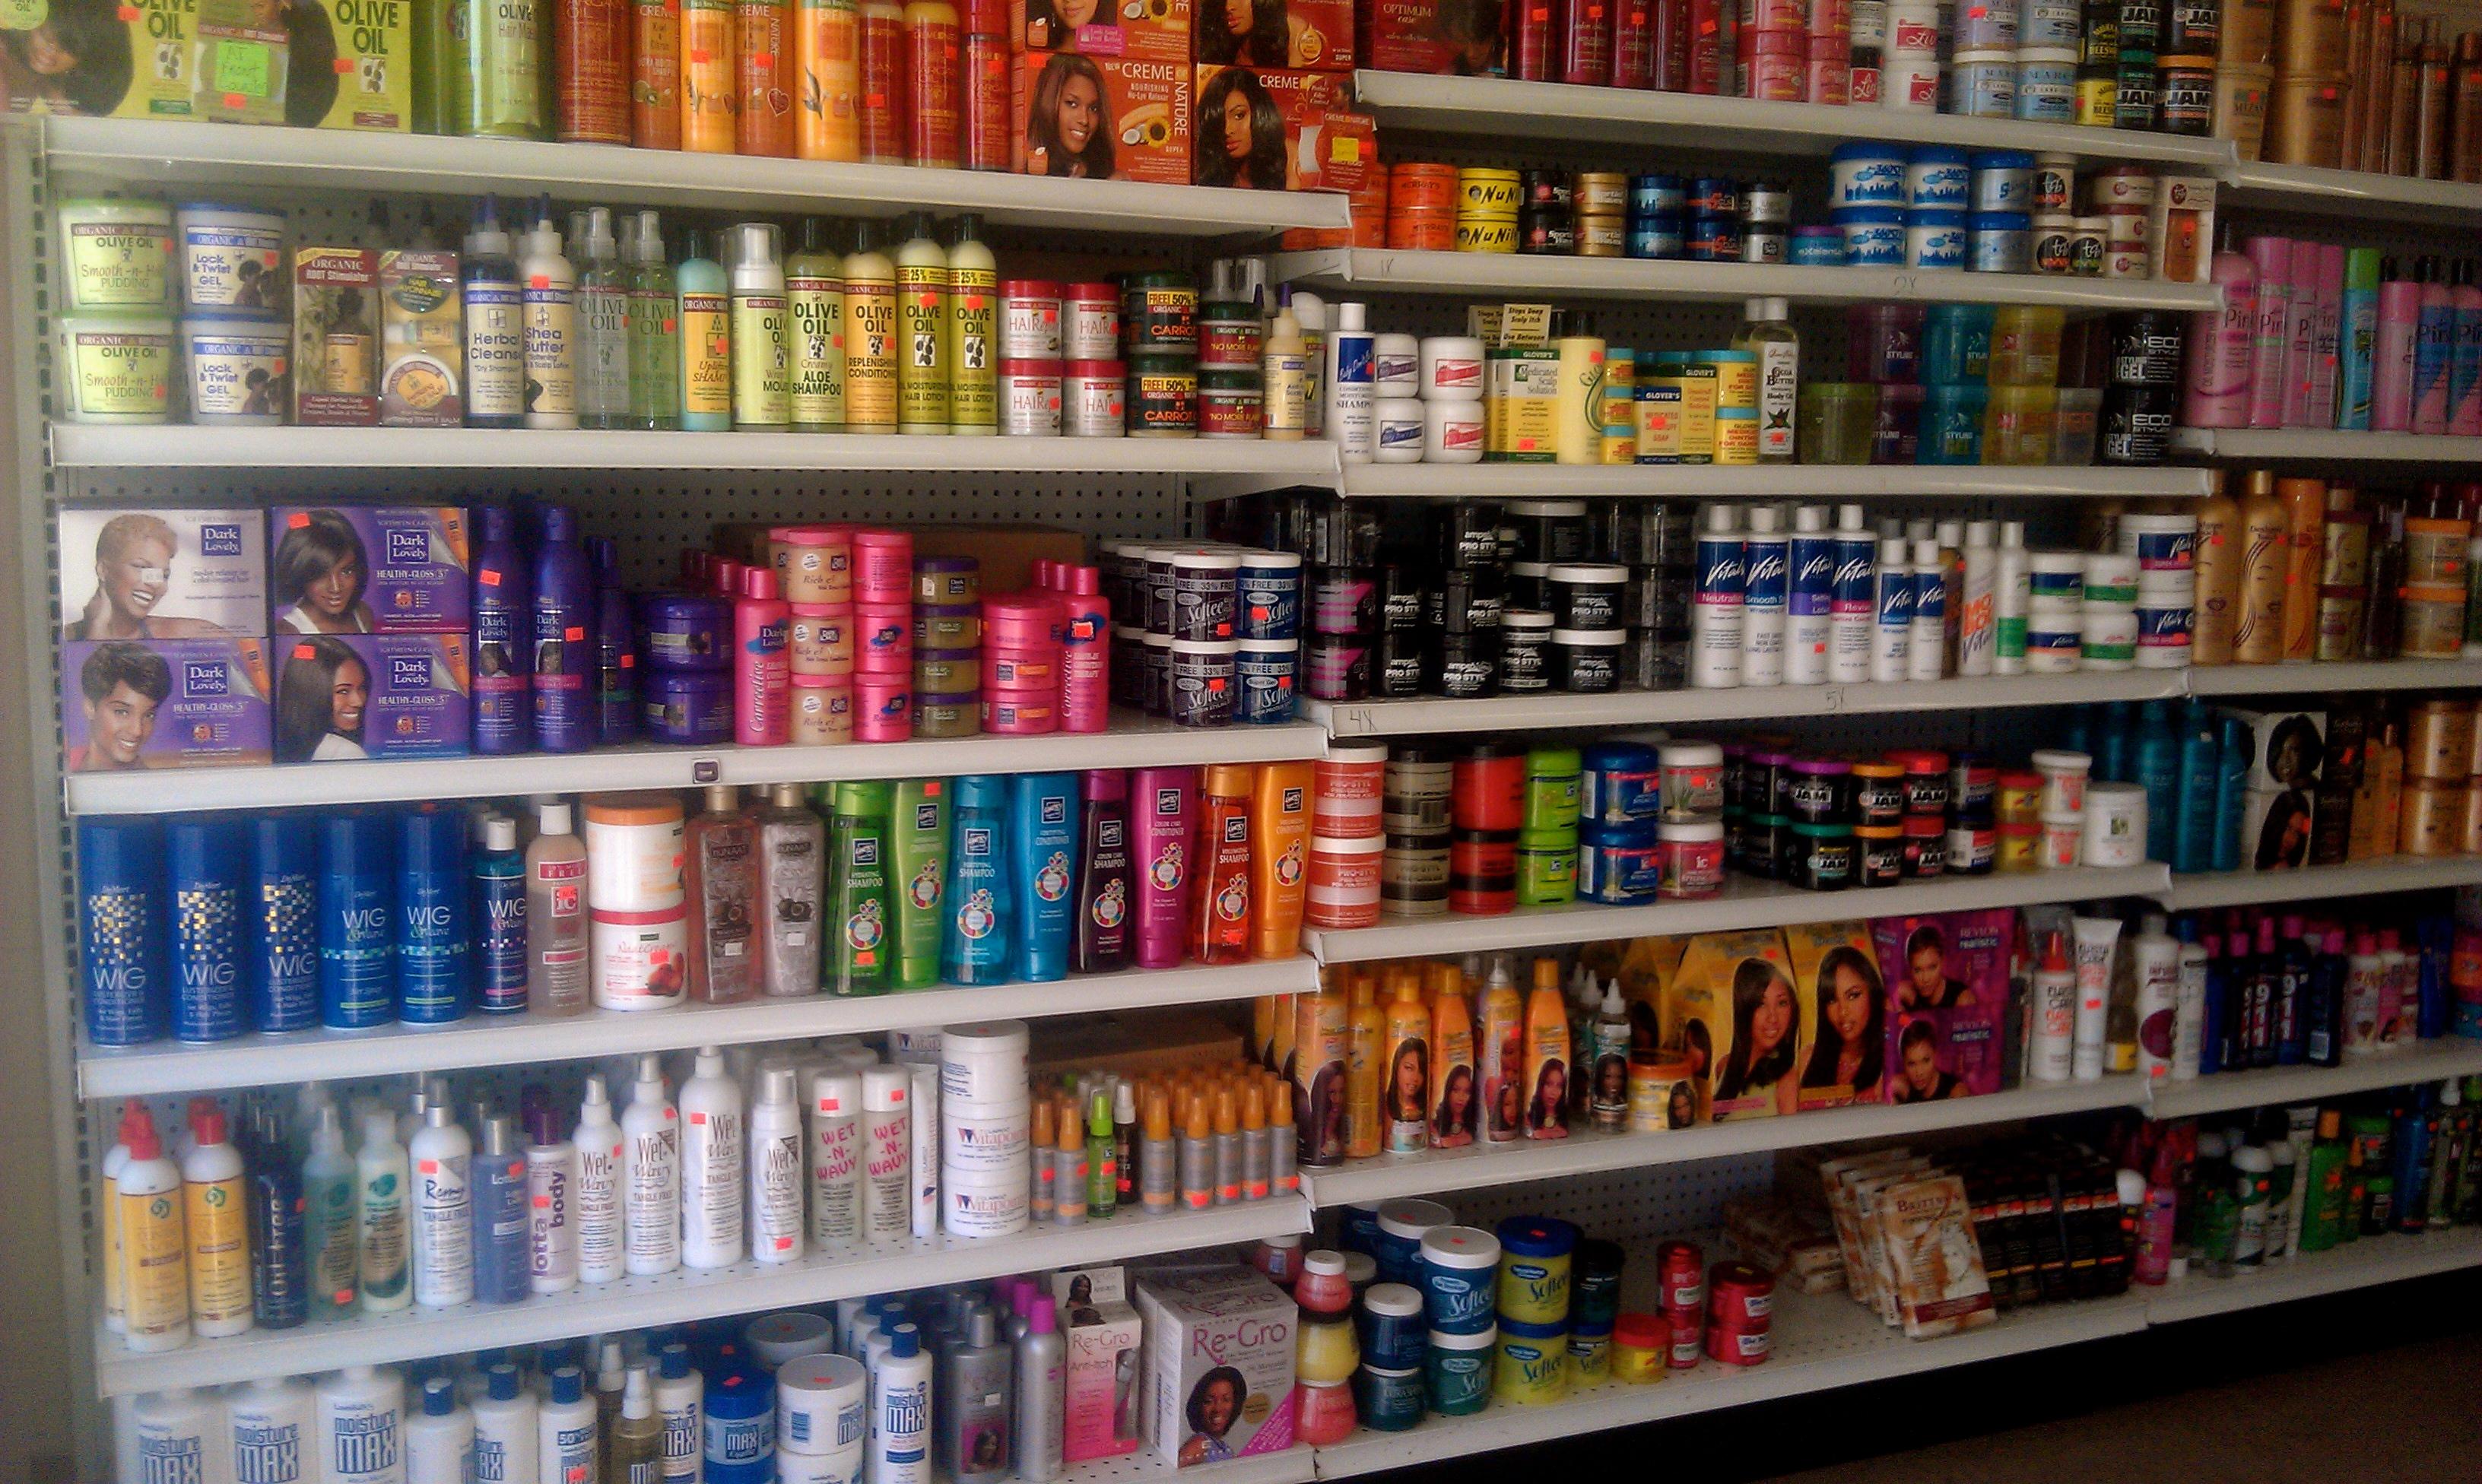 EampR Beauty Supply Store Eiufresh